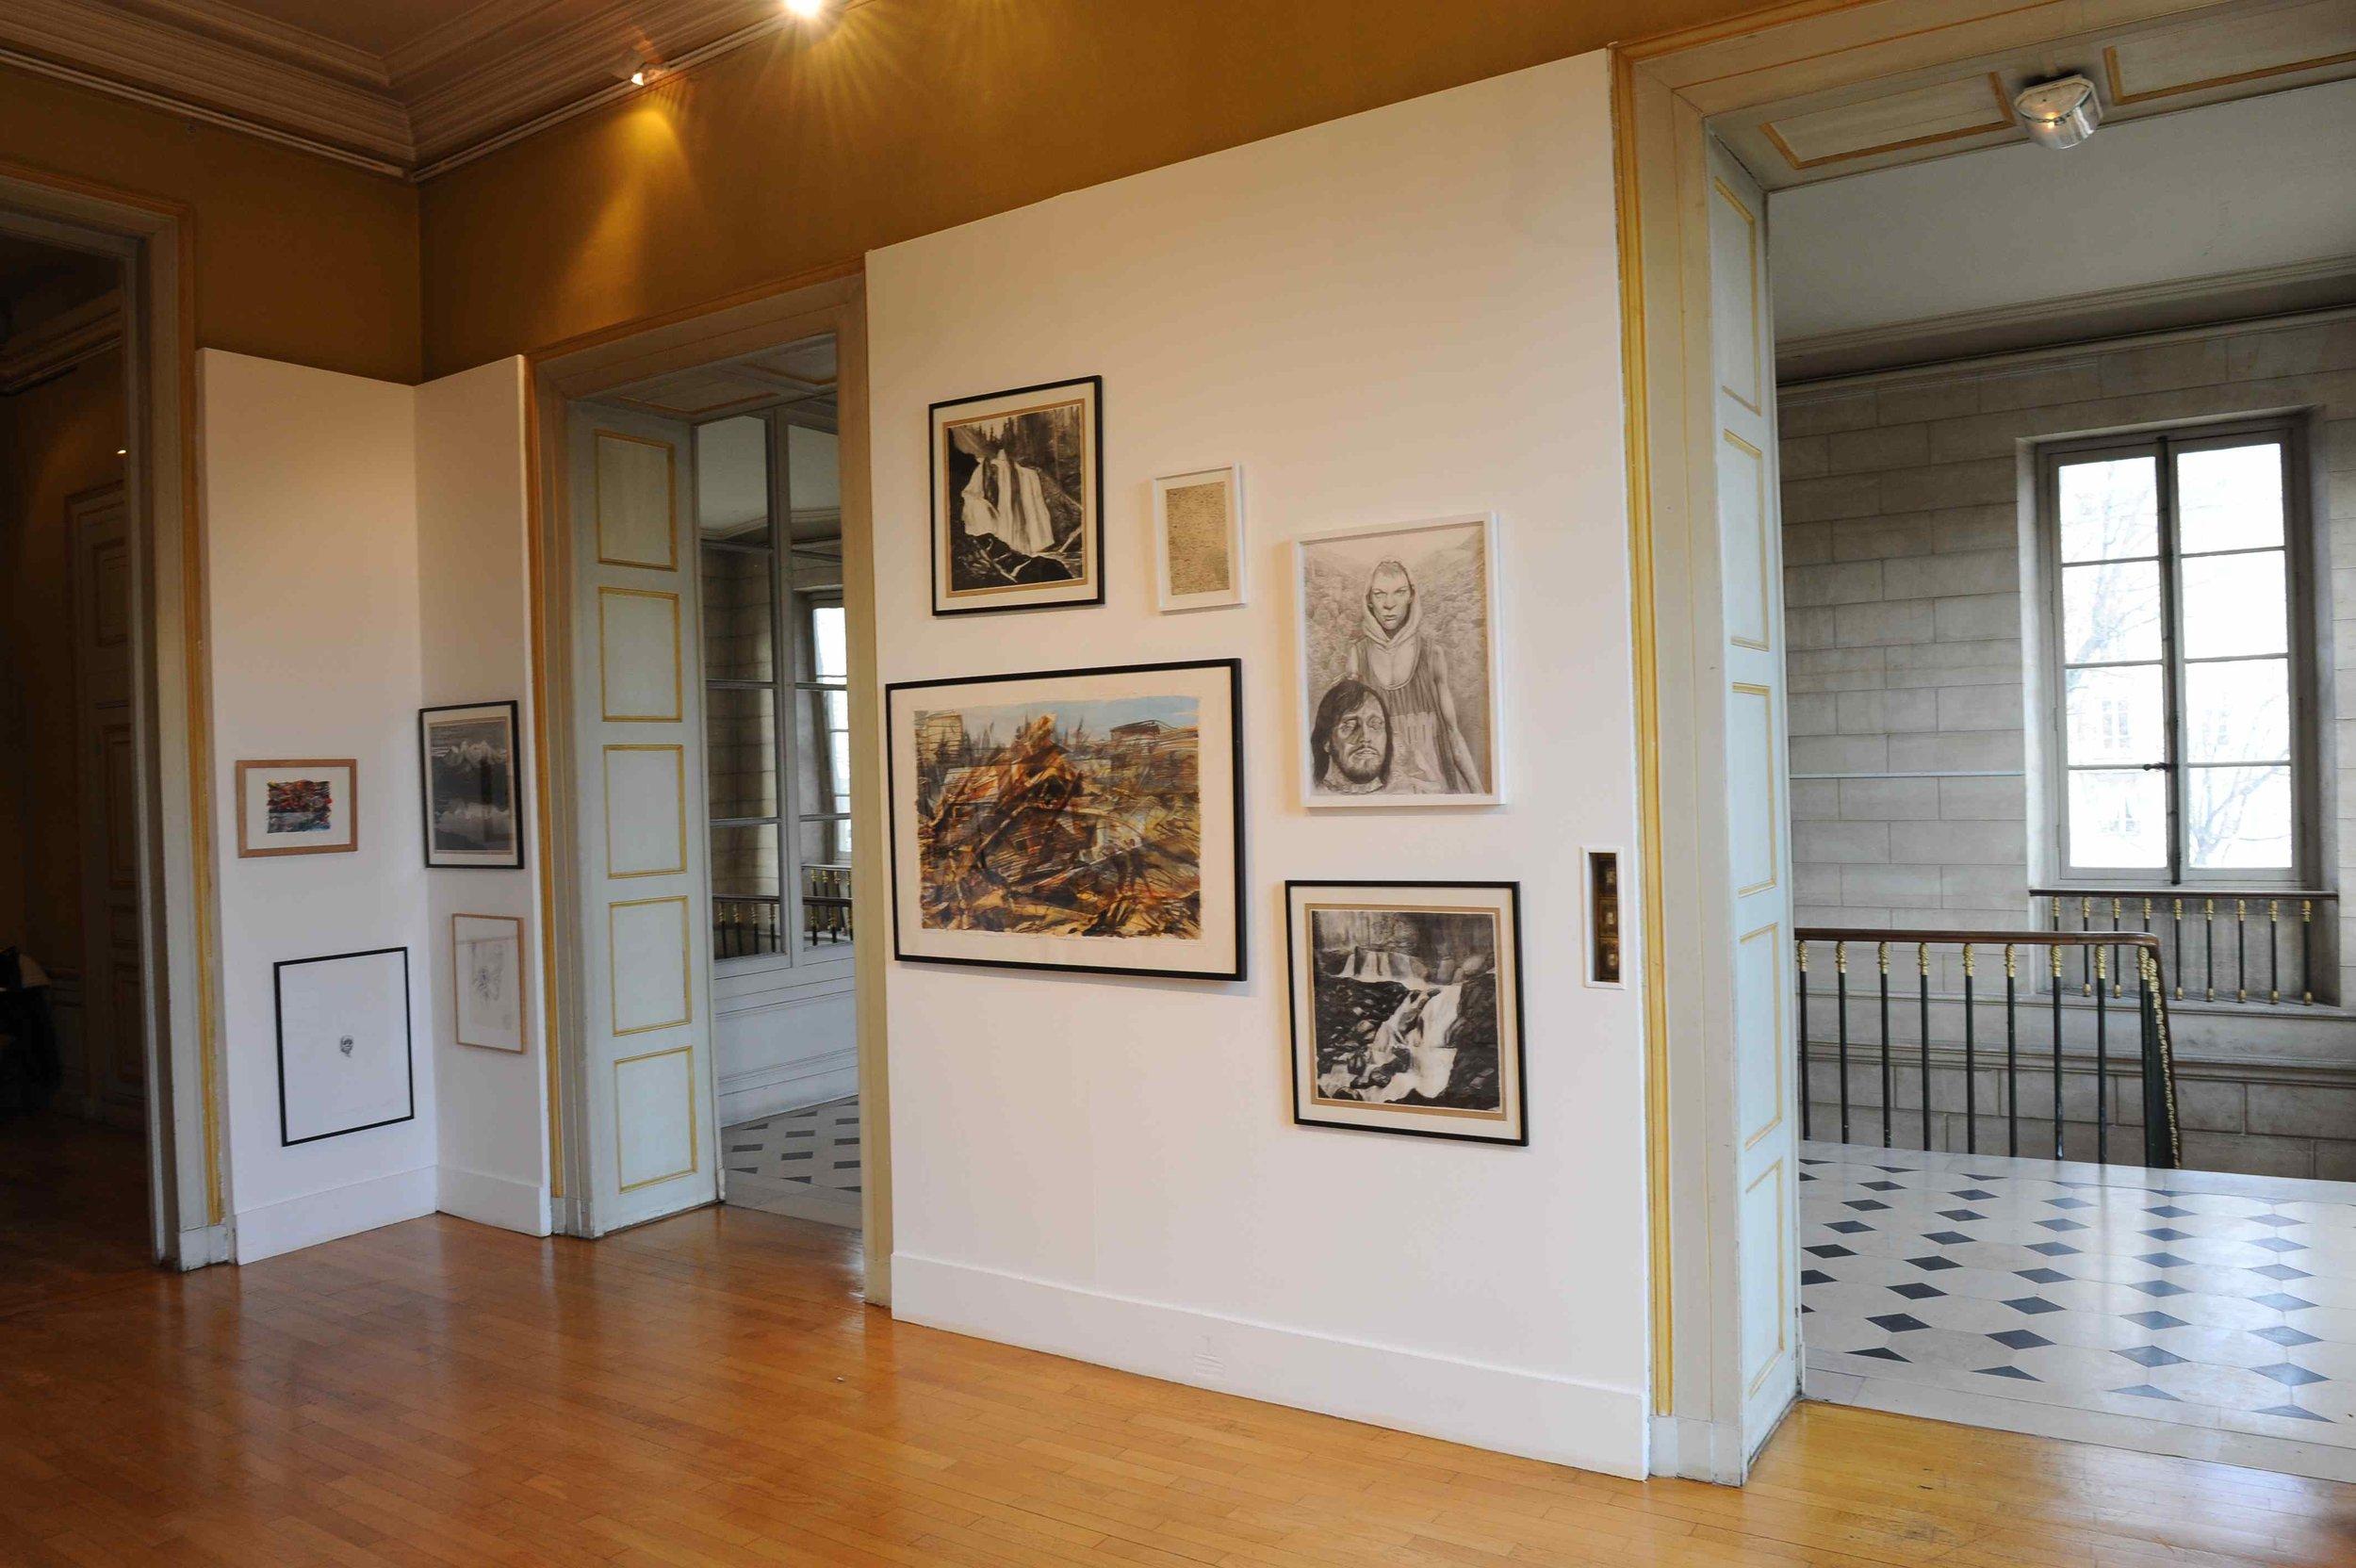 Des paysages, des Figures, Château de St Ouen, 2011.Curator Olivier Masmonteil.Artists in view : Duncan Wylie, Axel Pahlavi, Olivier Masmonteil